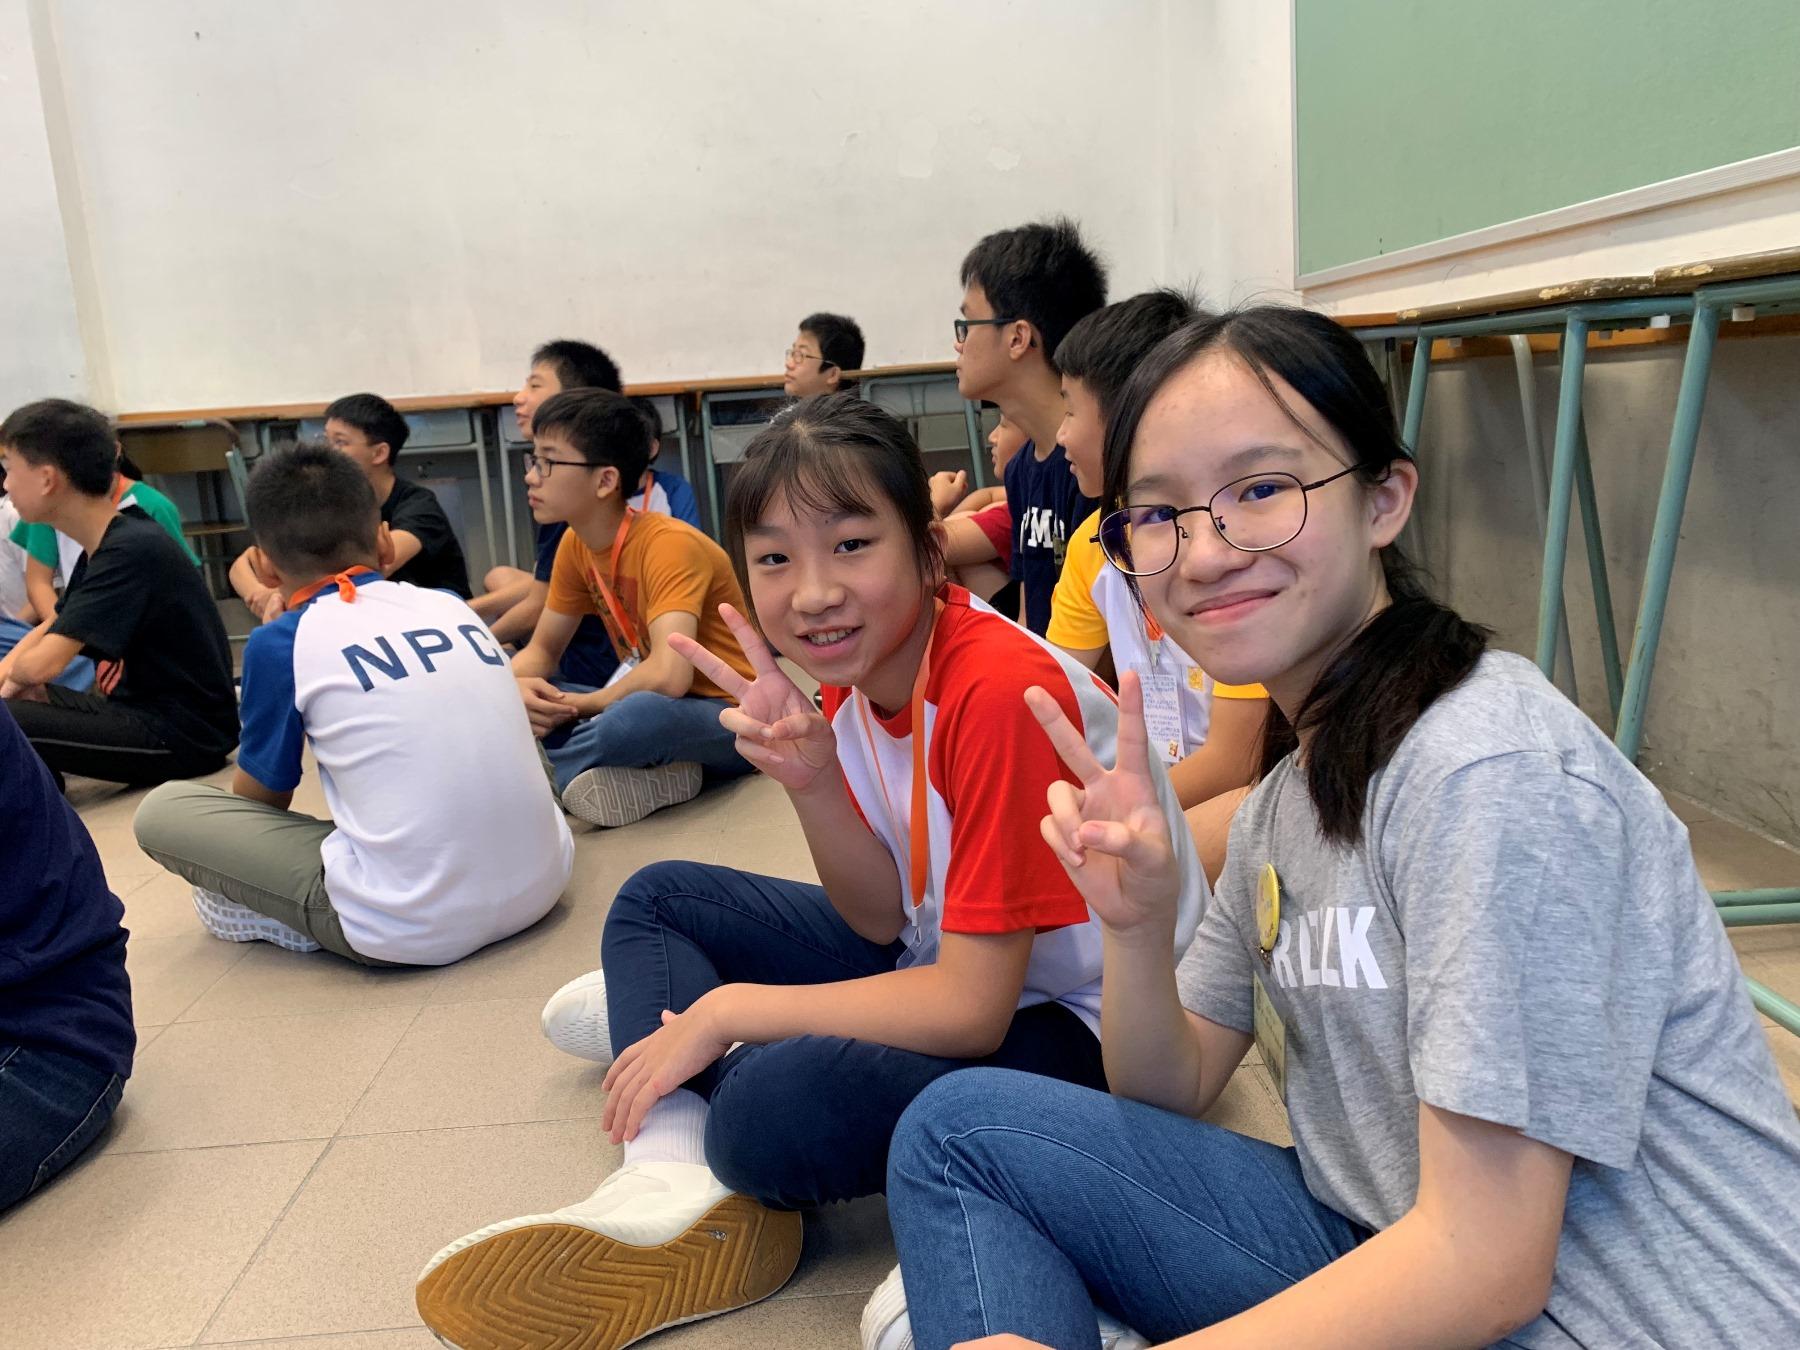 http://npc.edu.hk/sites/default/files/img_9585_2.jpg